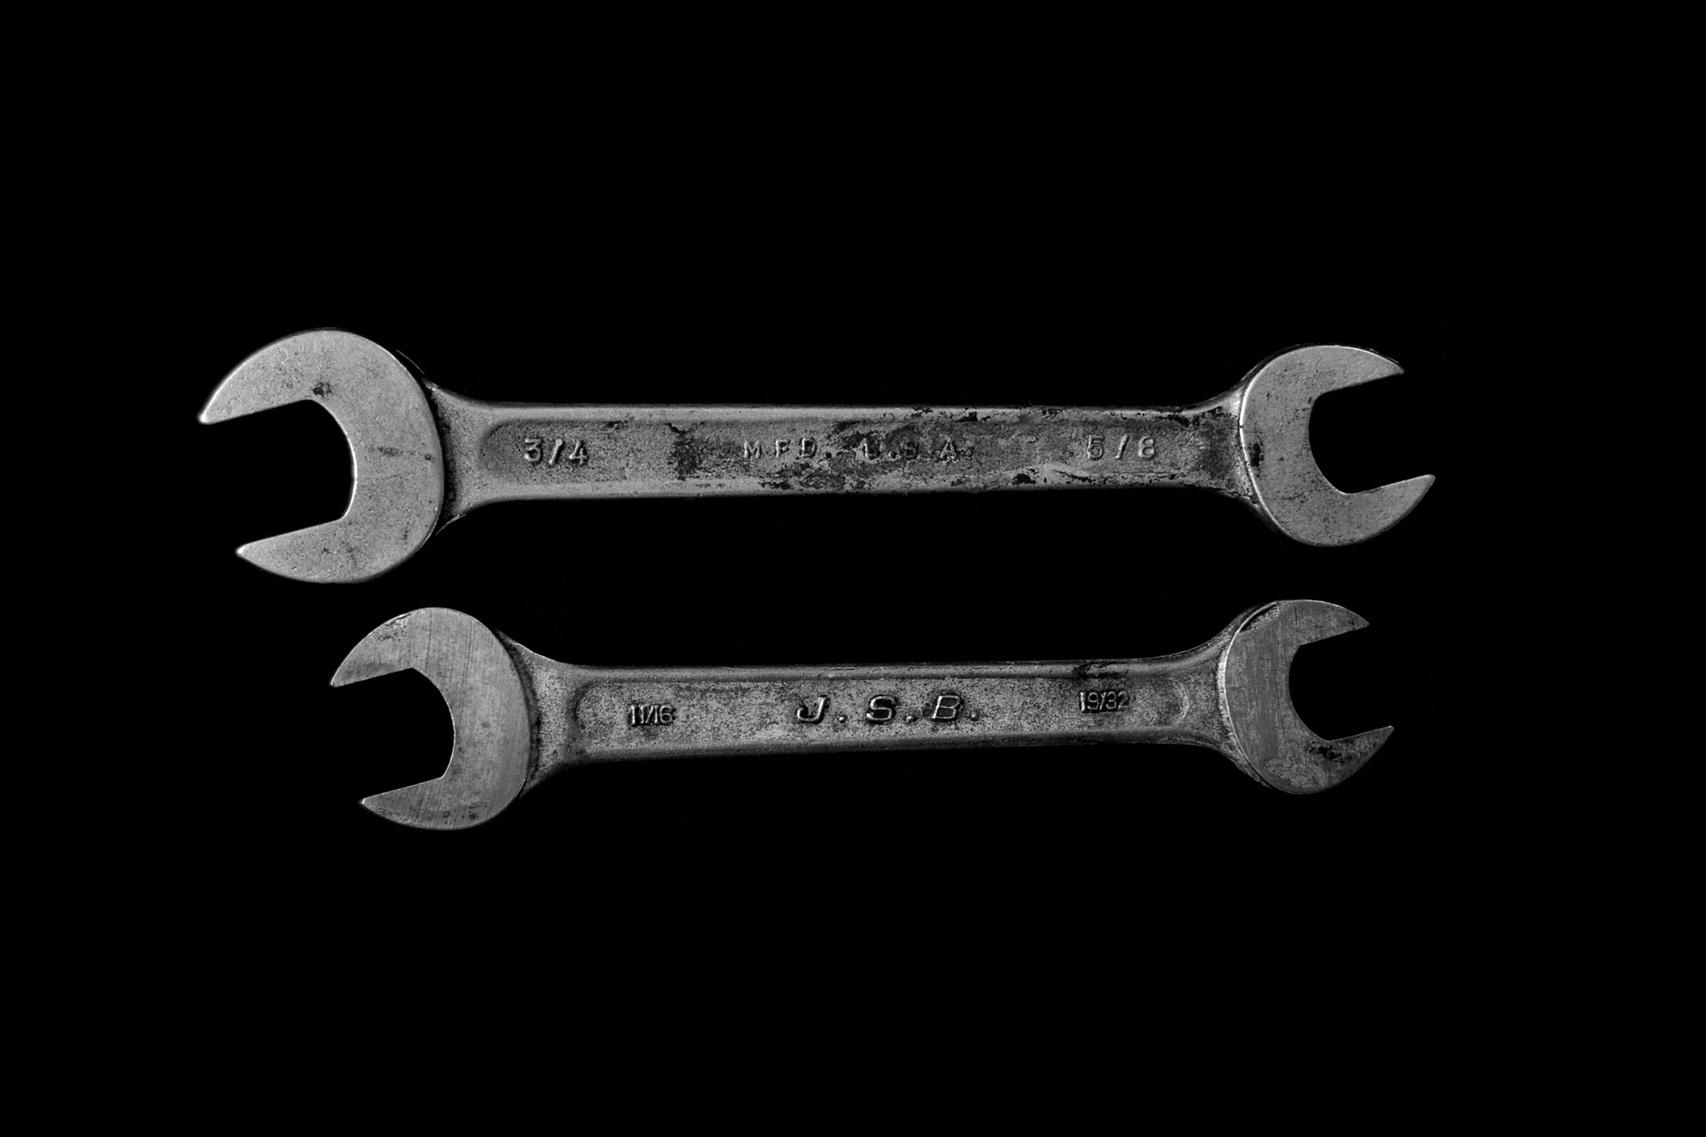 Cardano Smart Contract Tools